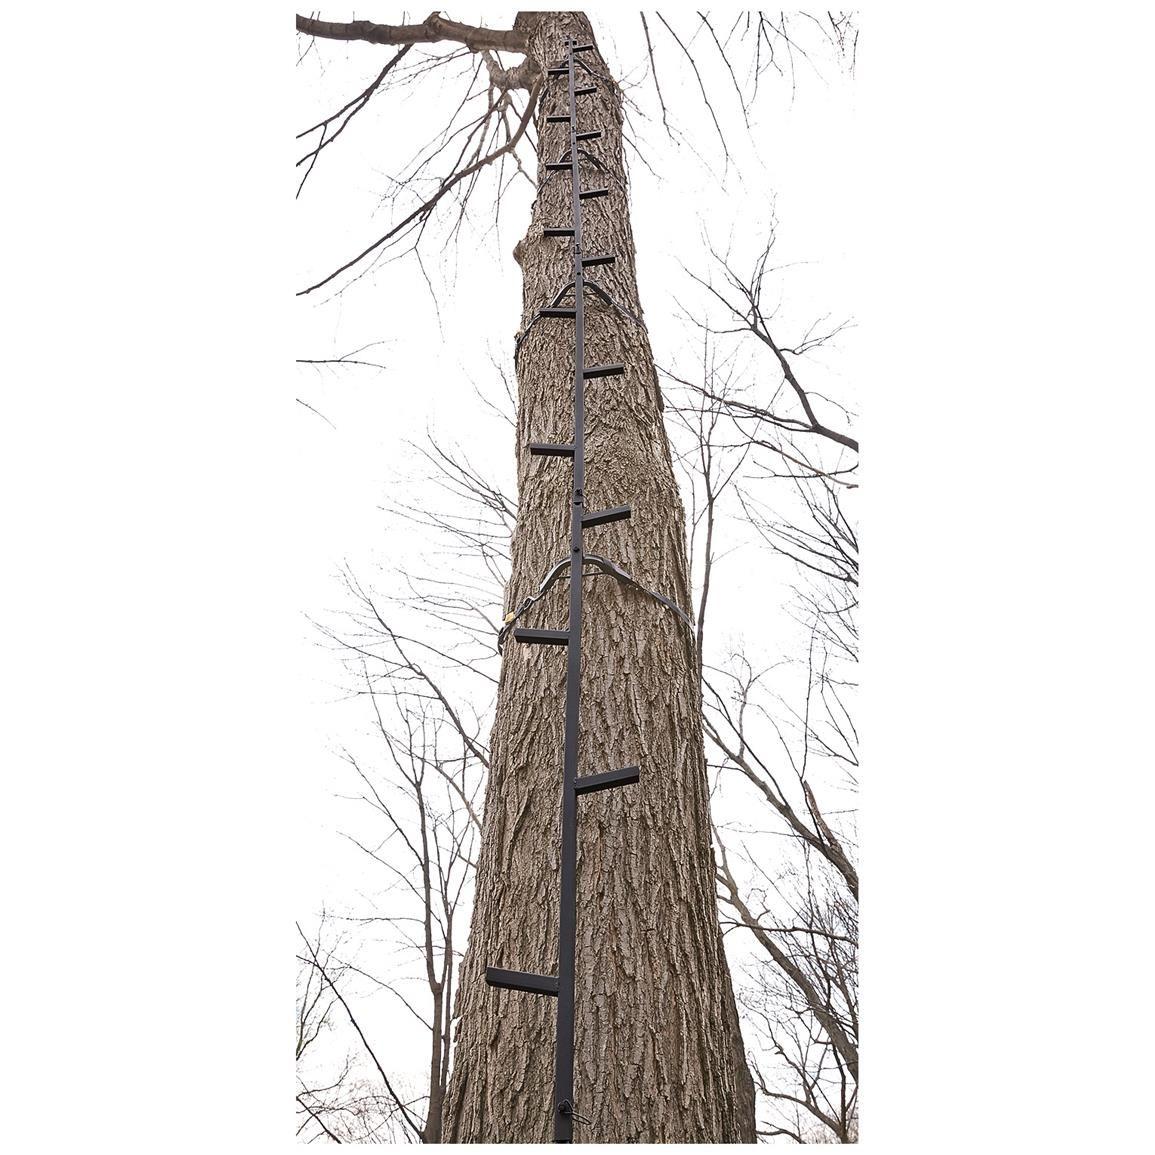 Guide Gear 25 Climbing Sticks Hunting Tree Stand Tree